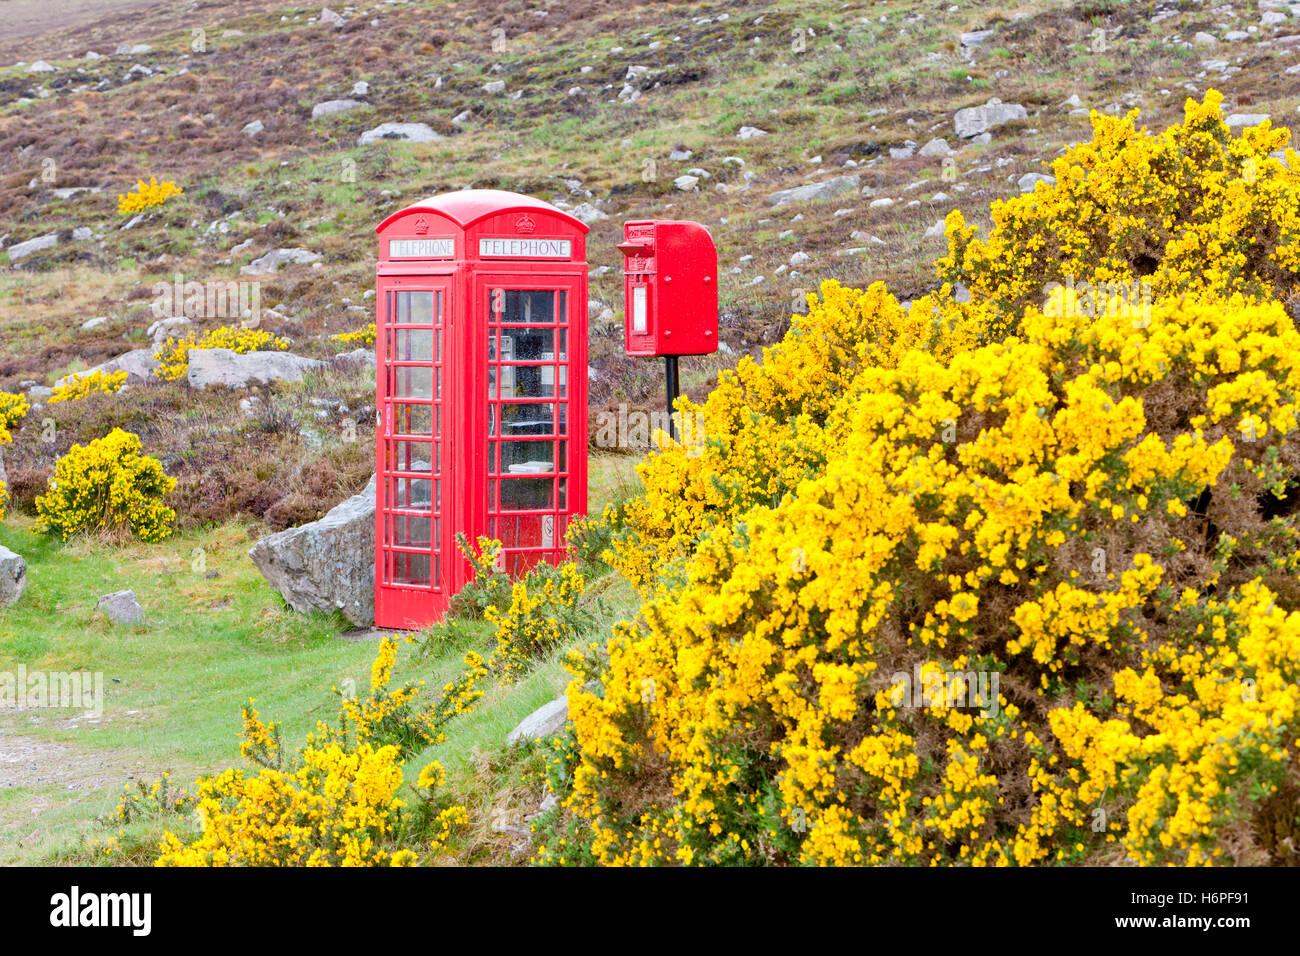 telephone box phonebooth telephone kiosk telephone booth telephone phone flora europe spring bouncing bounces hop - Stock Image